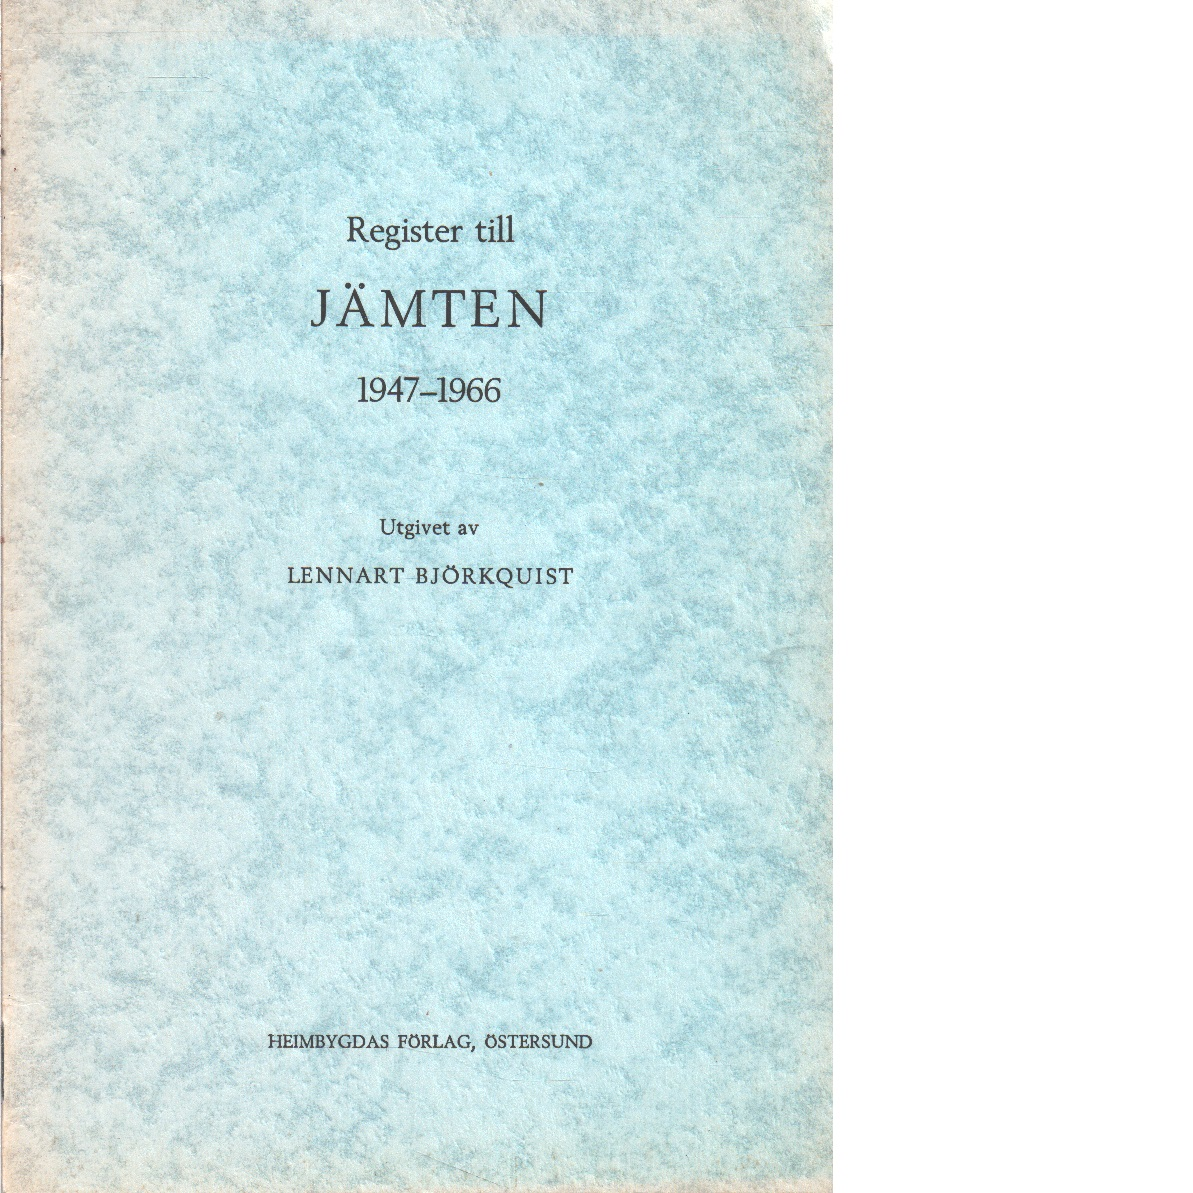 Register till Jämten : Heimbygdas tidskrift 1947-1966 - Red. Björkquist, Lennart